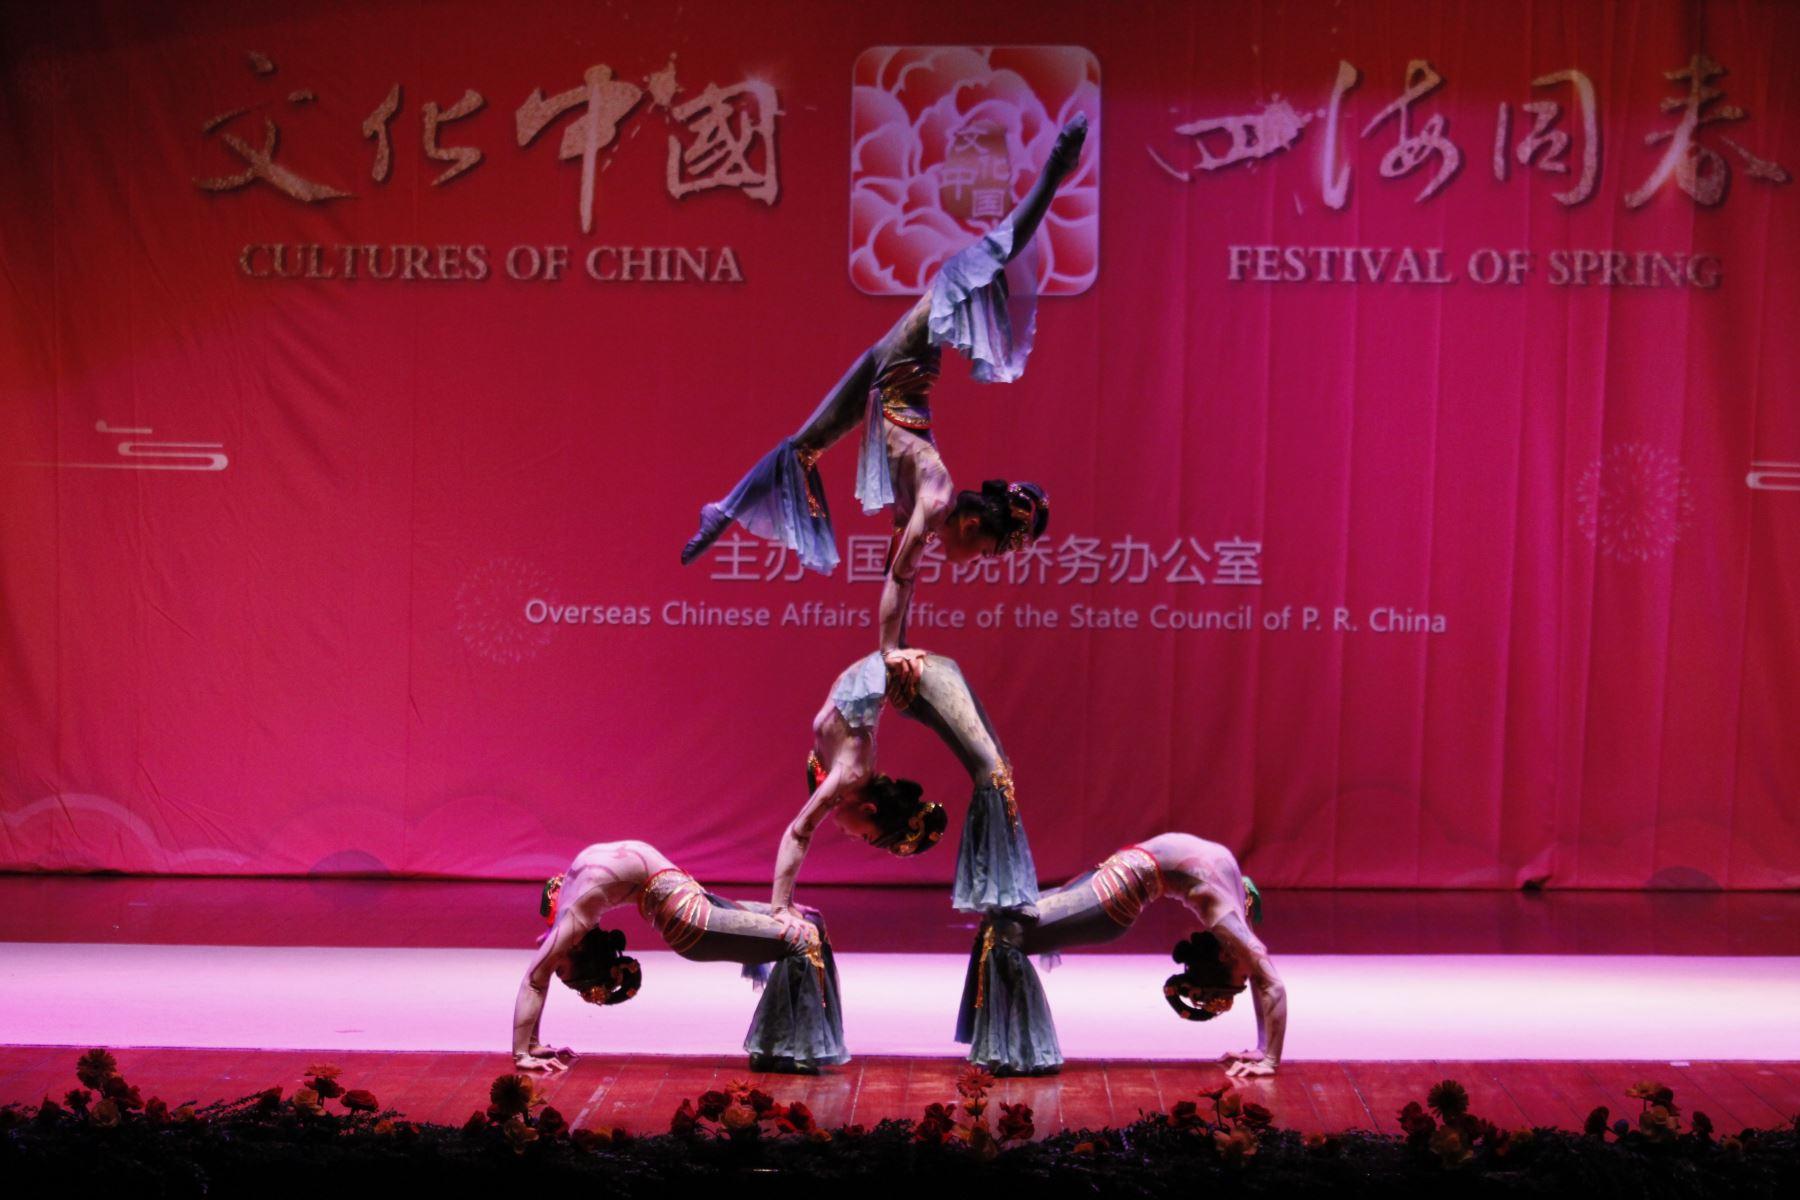 Elenco de acrobacia de China